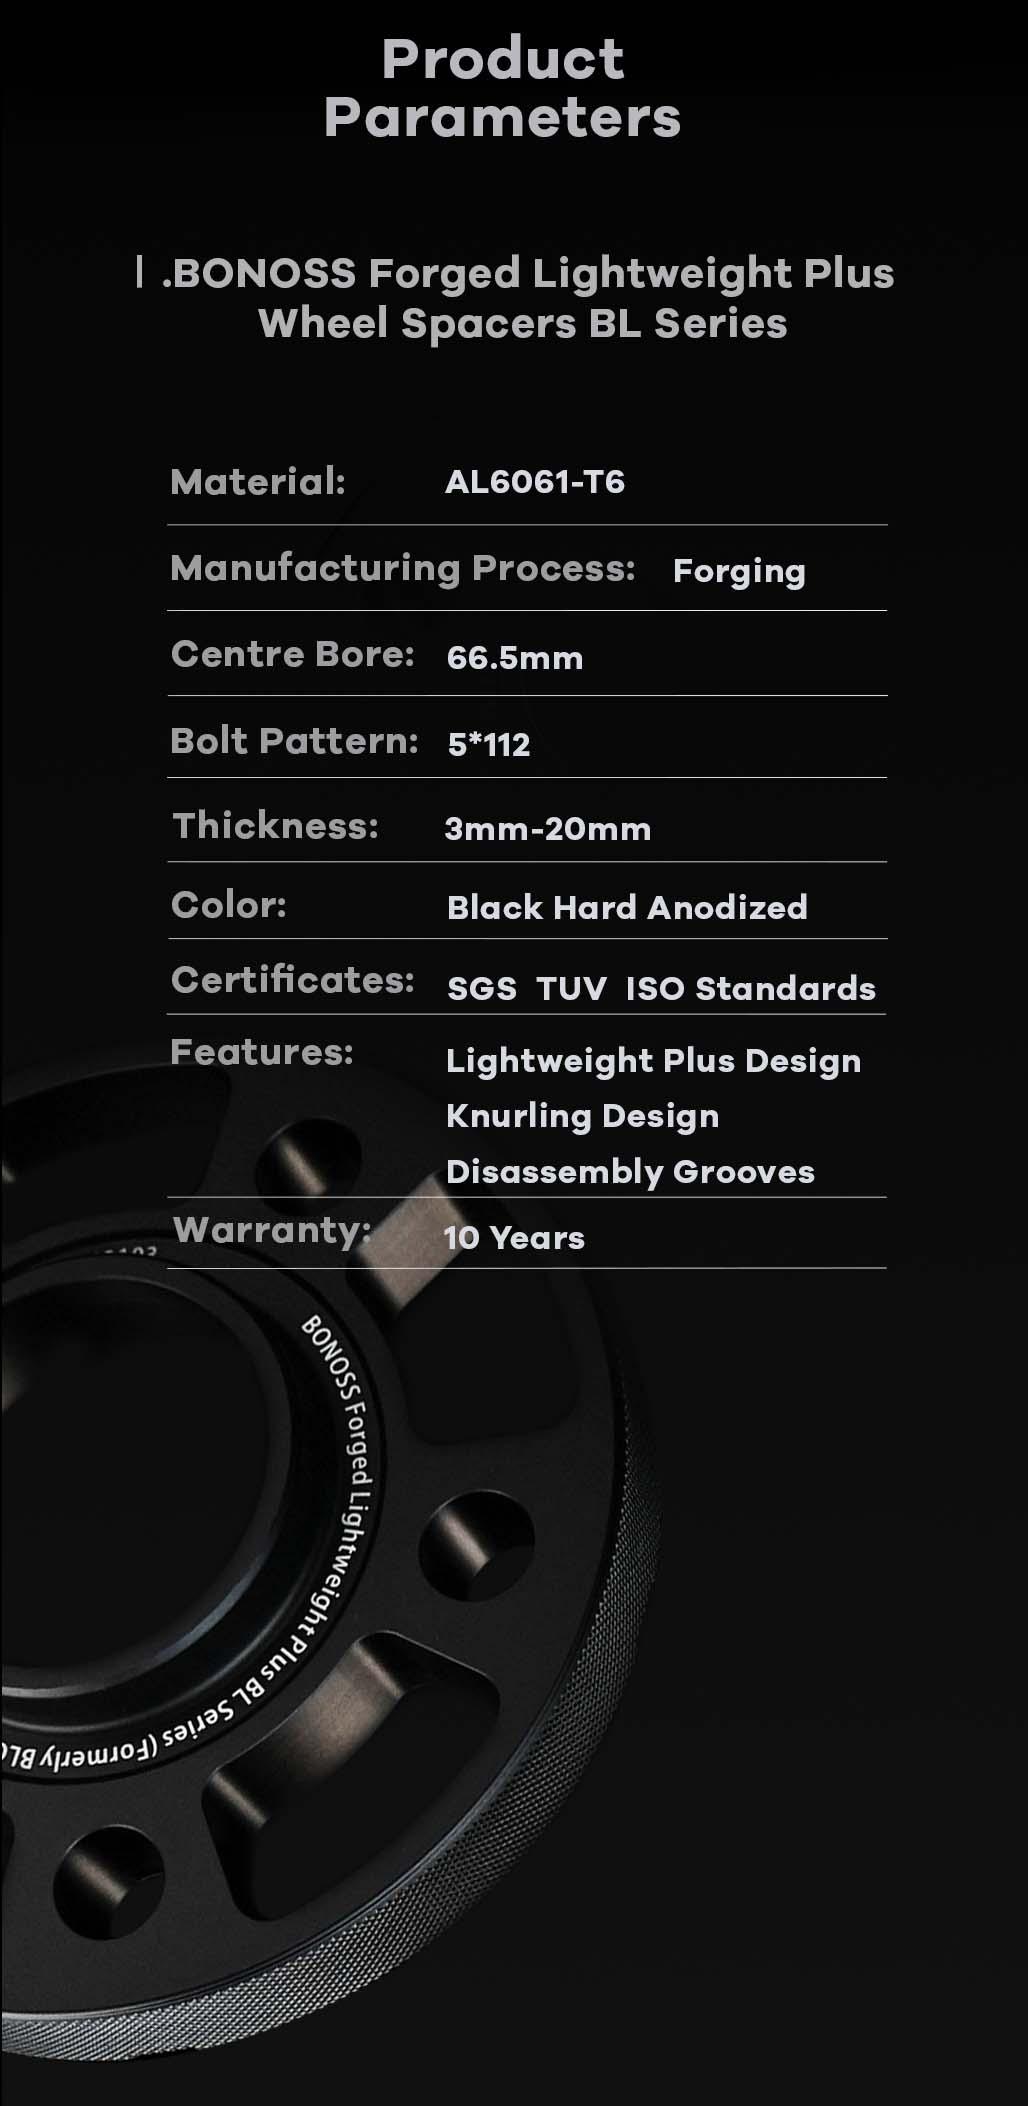 AL6061-T6 BONOSS forged lightweight plus wheel spacers 5x112 66.5 14x1.25 cone seat-by lulu-9